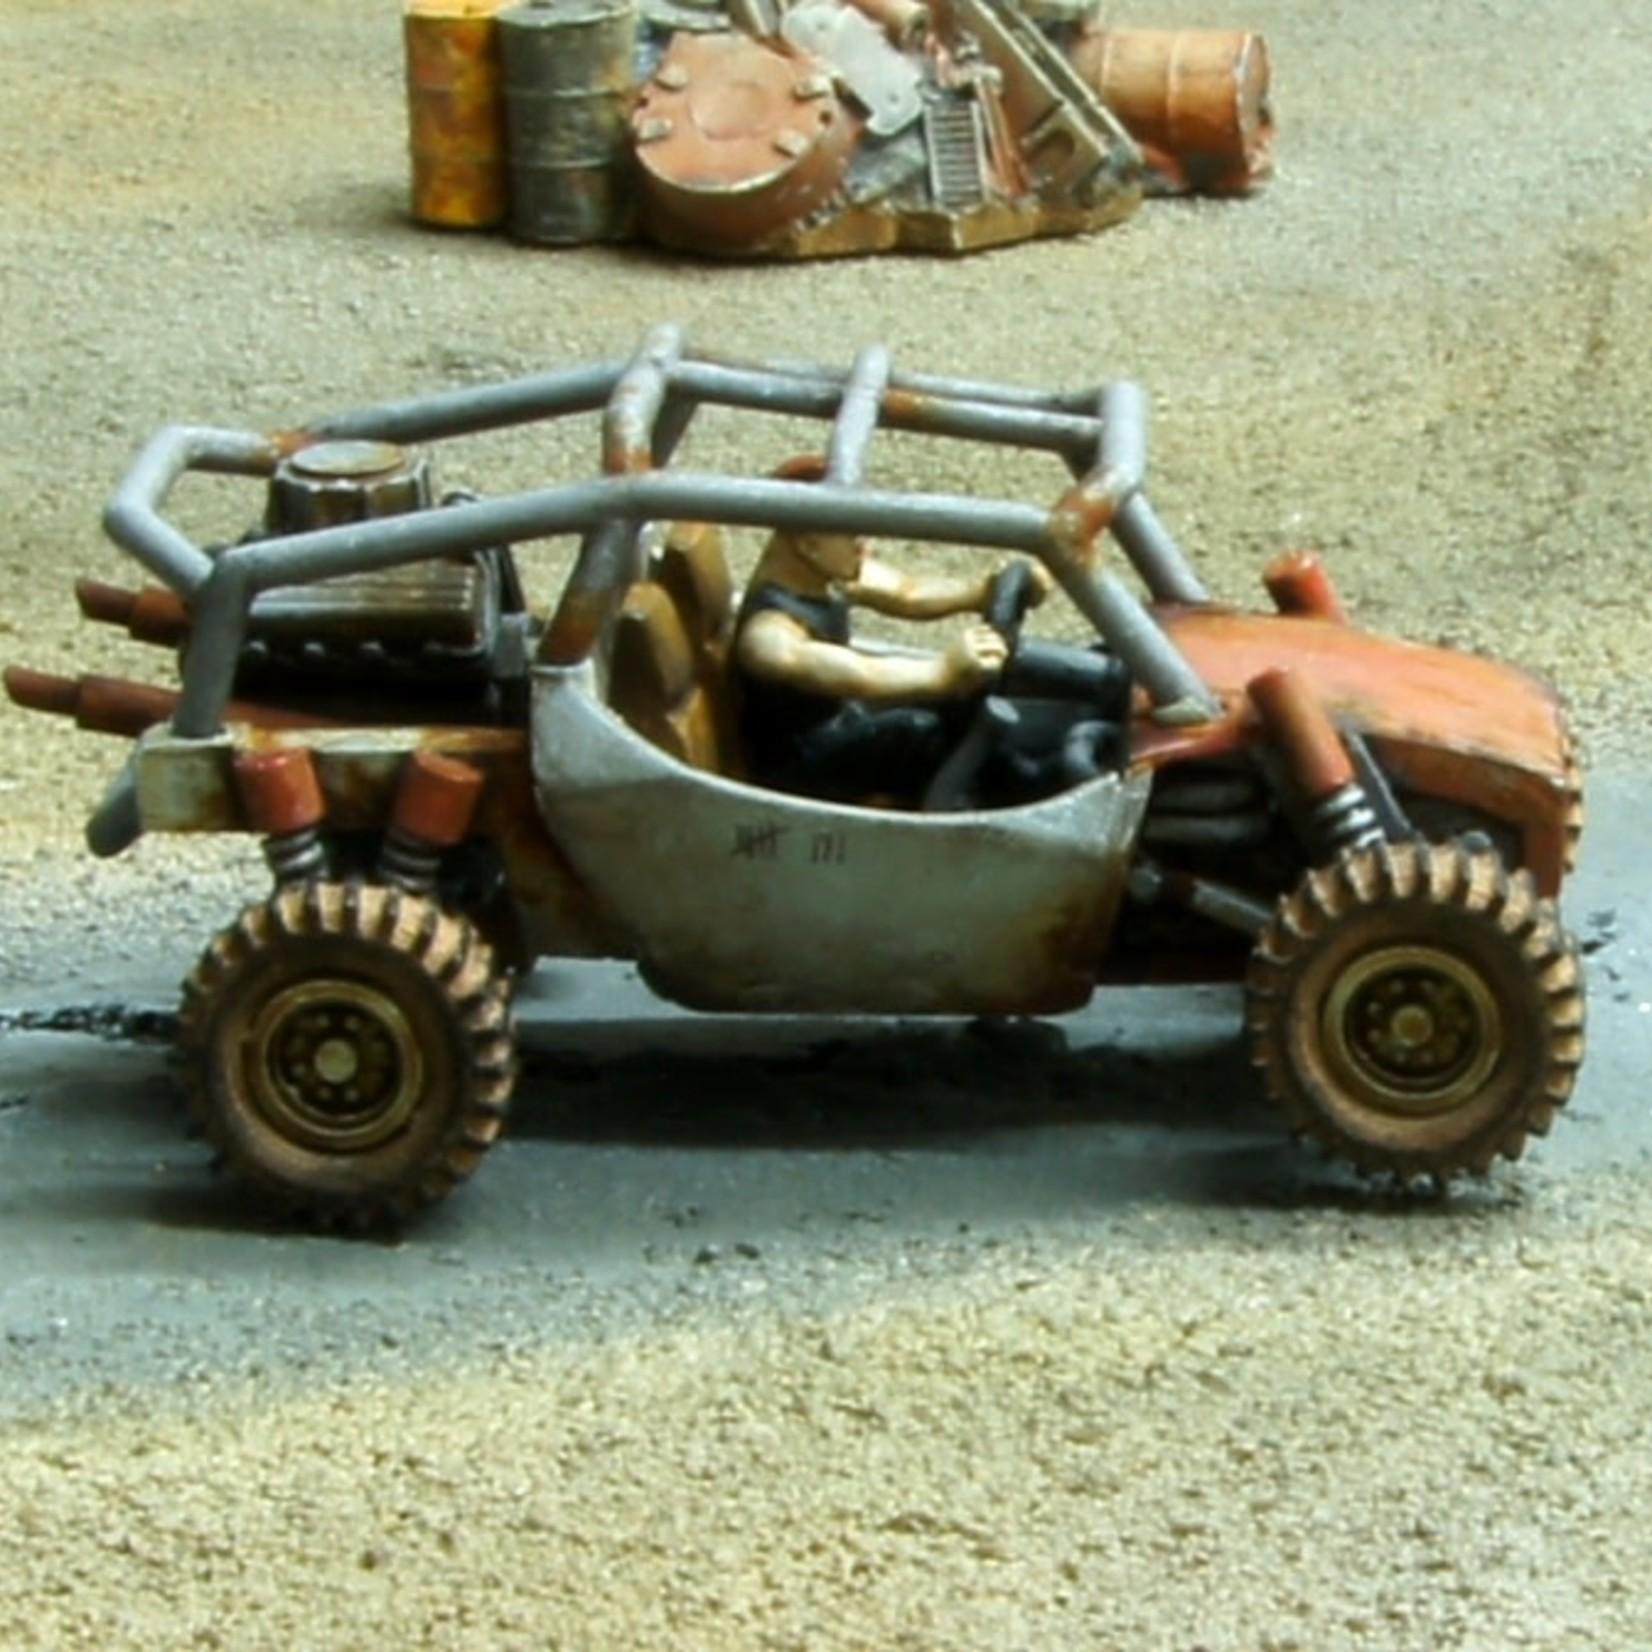 Buggy 1 - Rear Engine